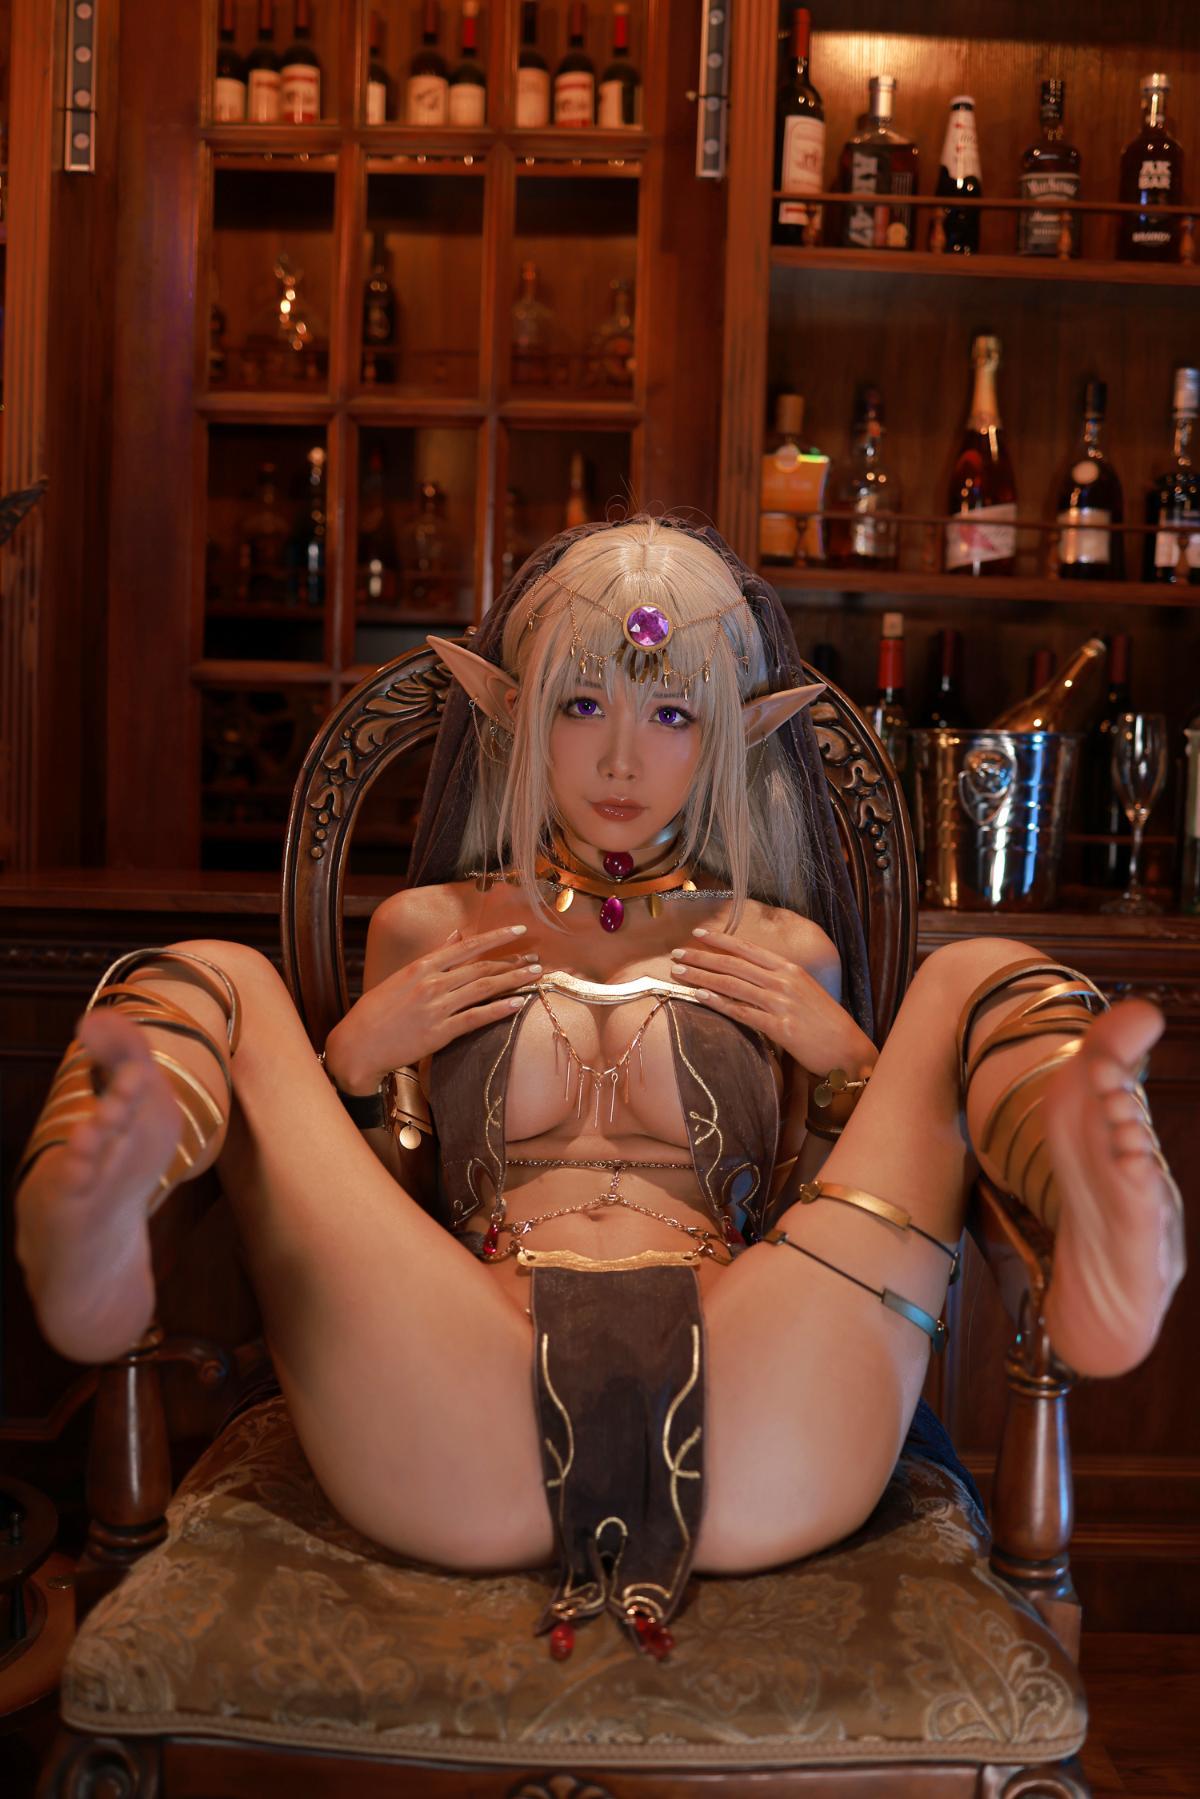 Tan Dancer Elf Succubus Cosplay by Aqua 45